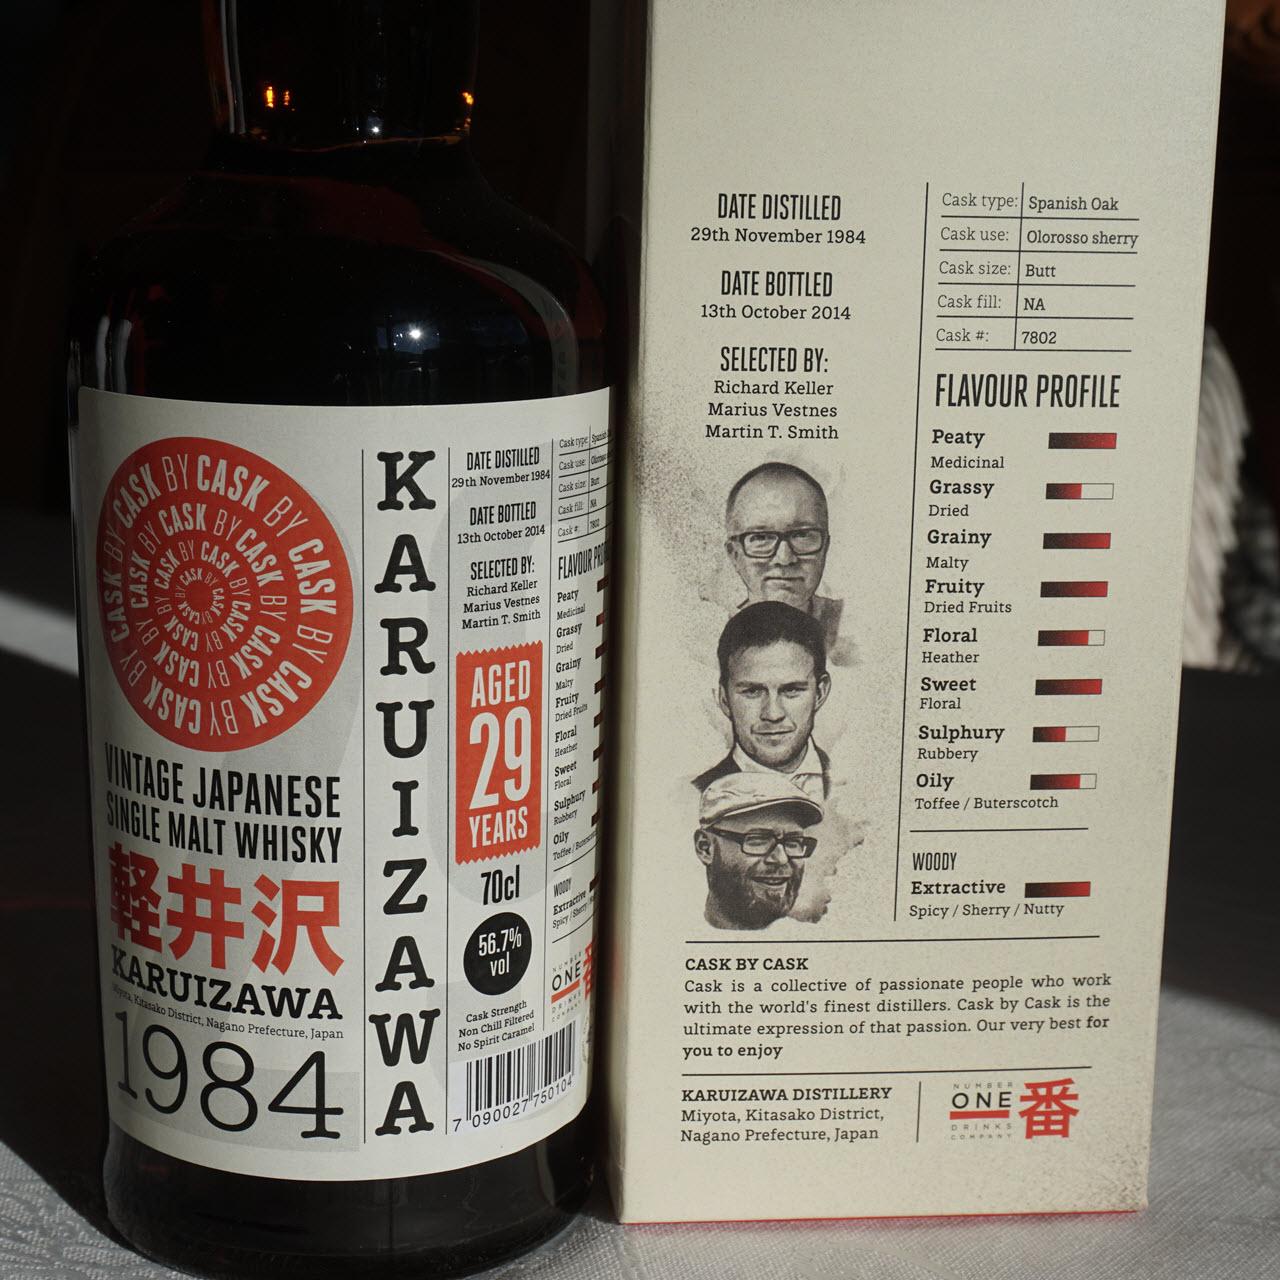 Karuizawa 1984 29 YO Cask #7802 Cask by Cask - details